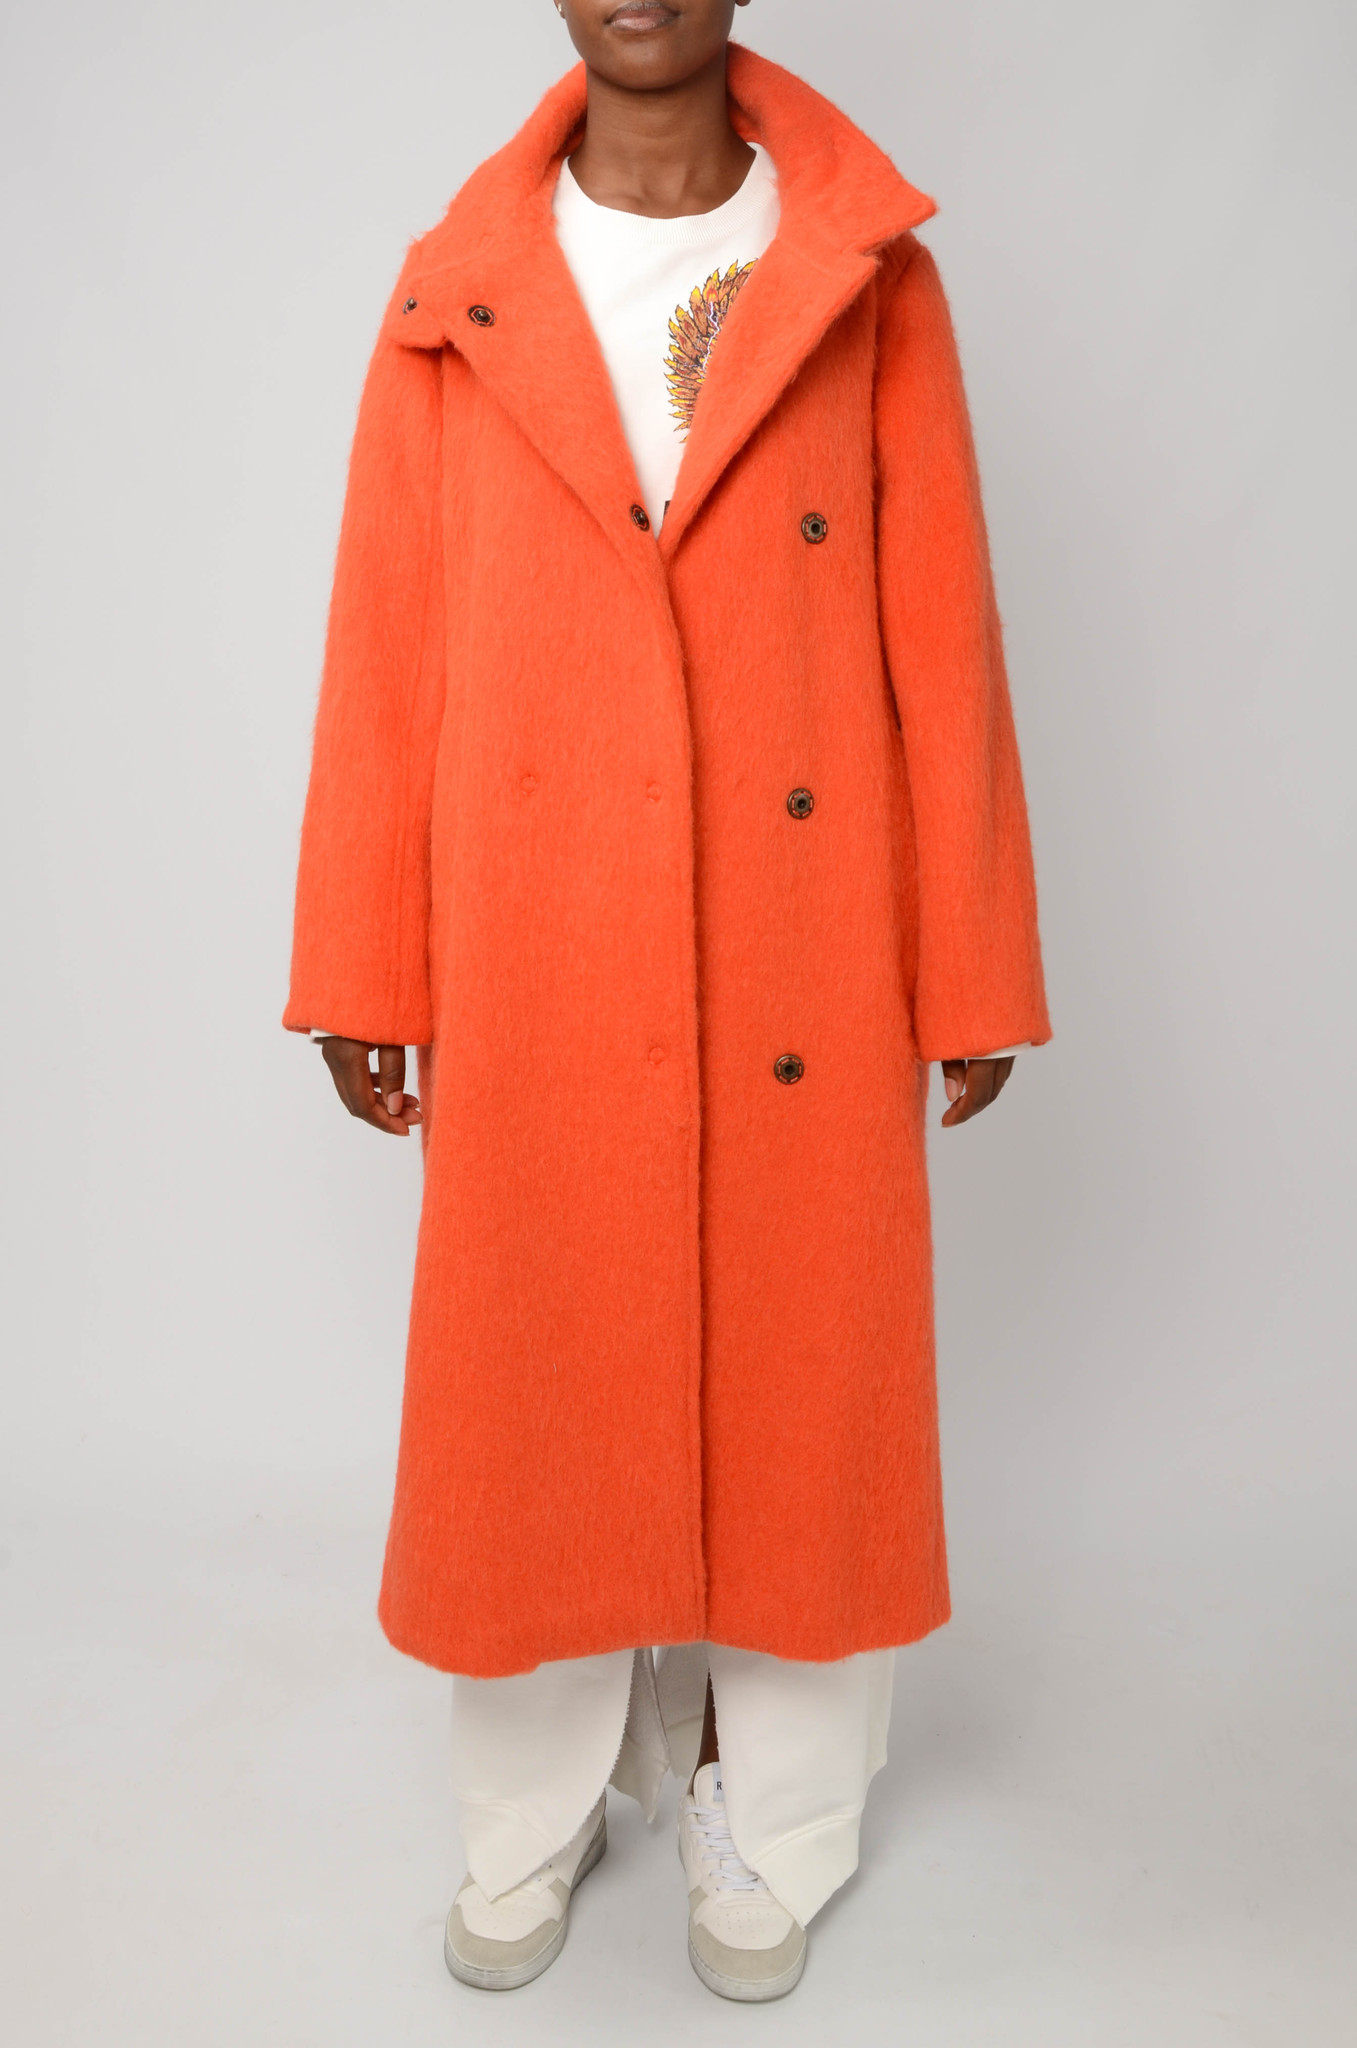 LONG BELTED COAT IN ORANGE-5